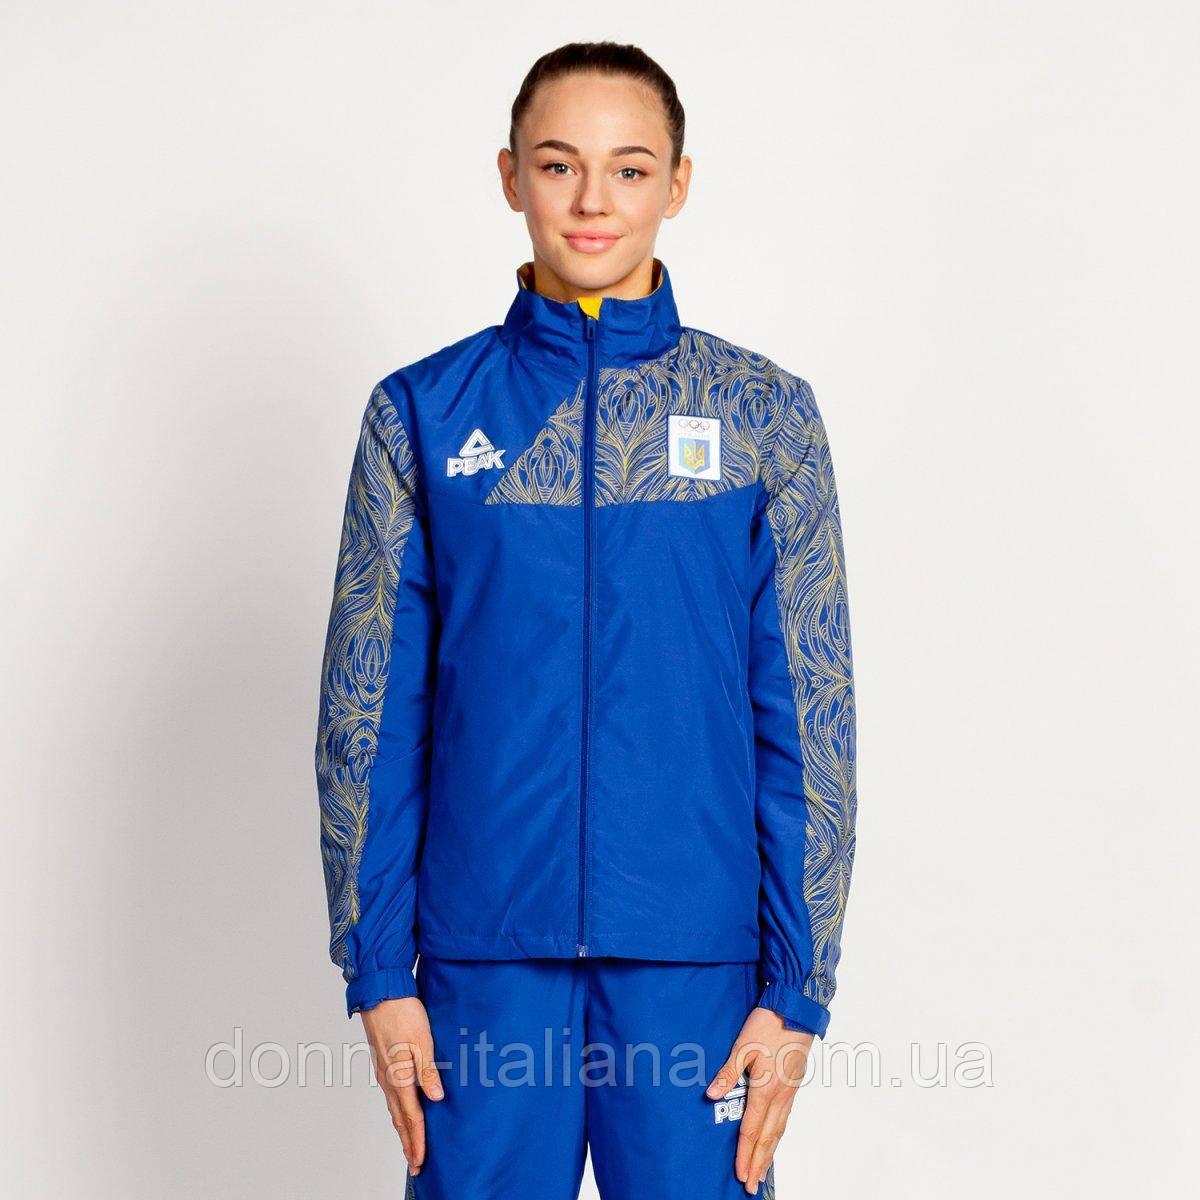 Спортивная кофта Peak Sport FS-UW1809NOK-T-BLU S Синяя (2000130257013)